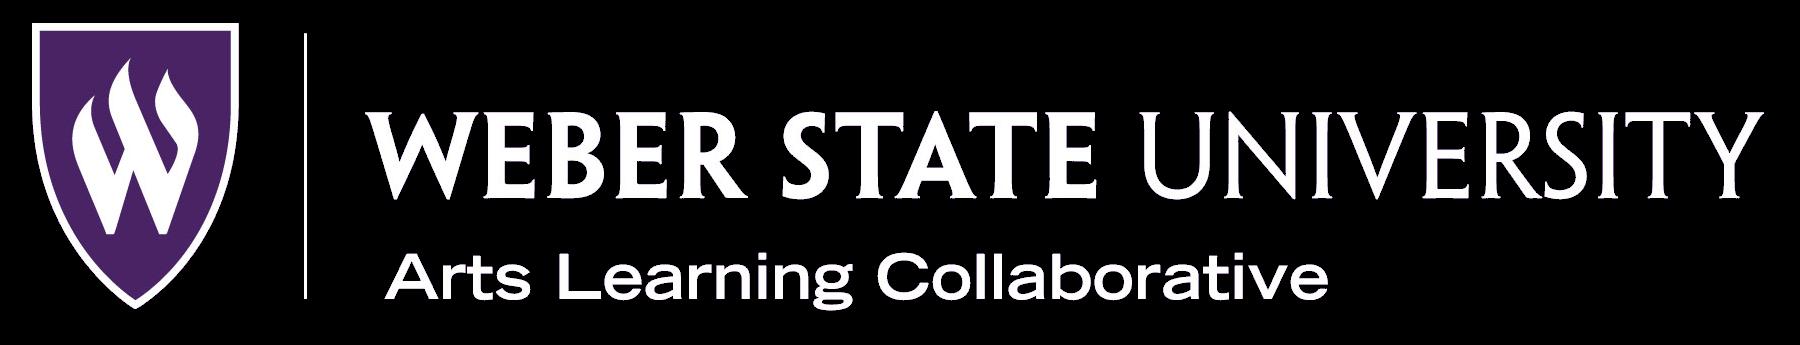 Arts Learning Collaborative